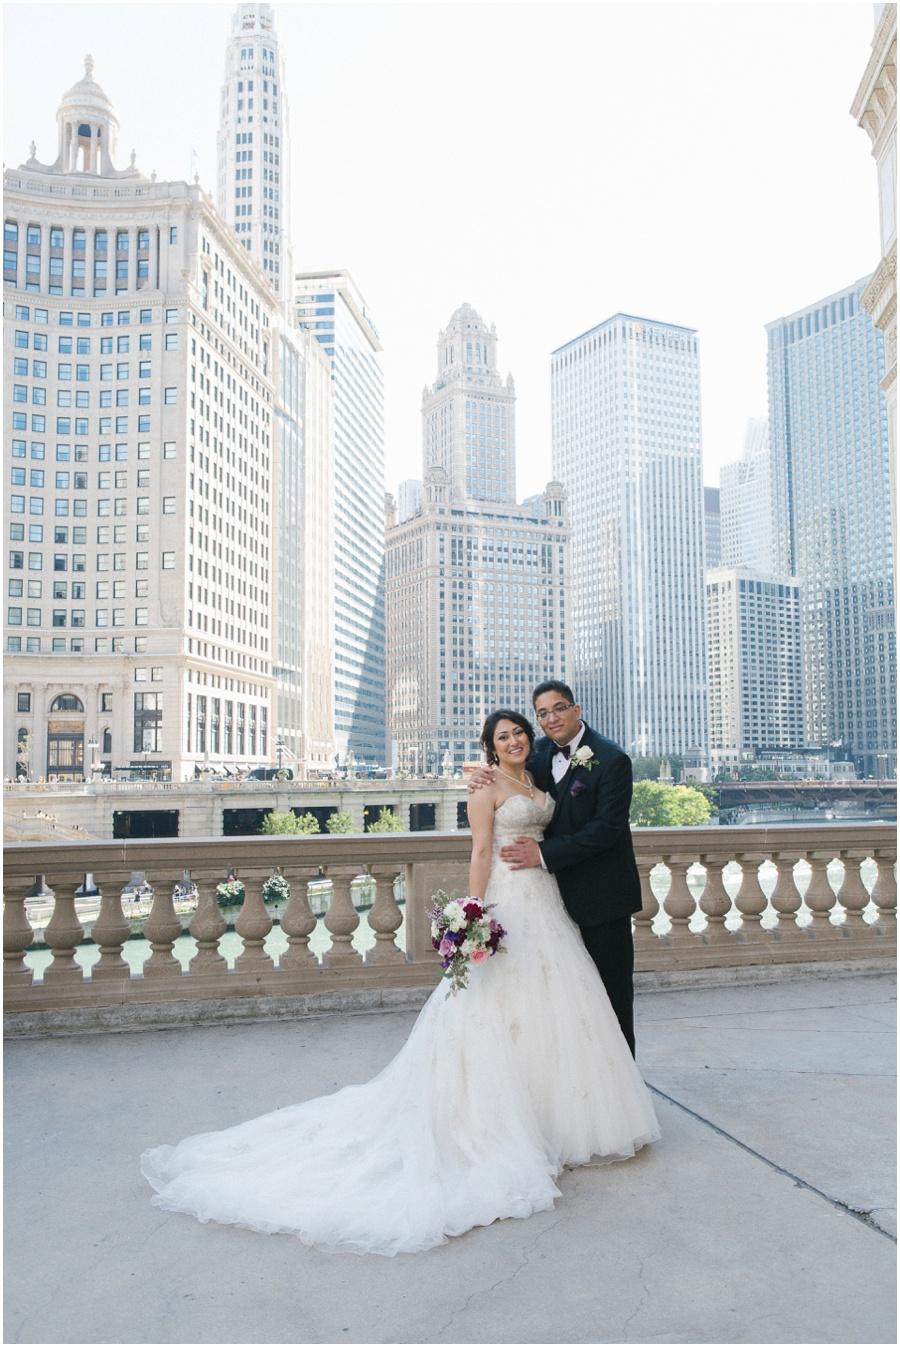 Memorable Jaunts Homer Glen Chicago IL Wedding at Dinolfo Banquets